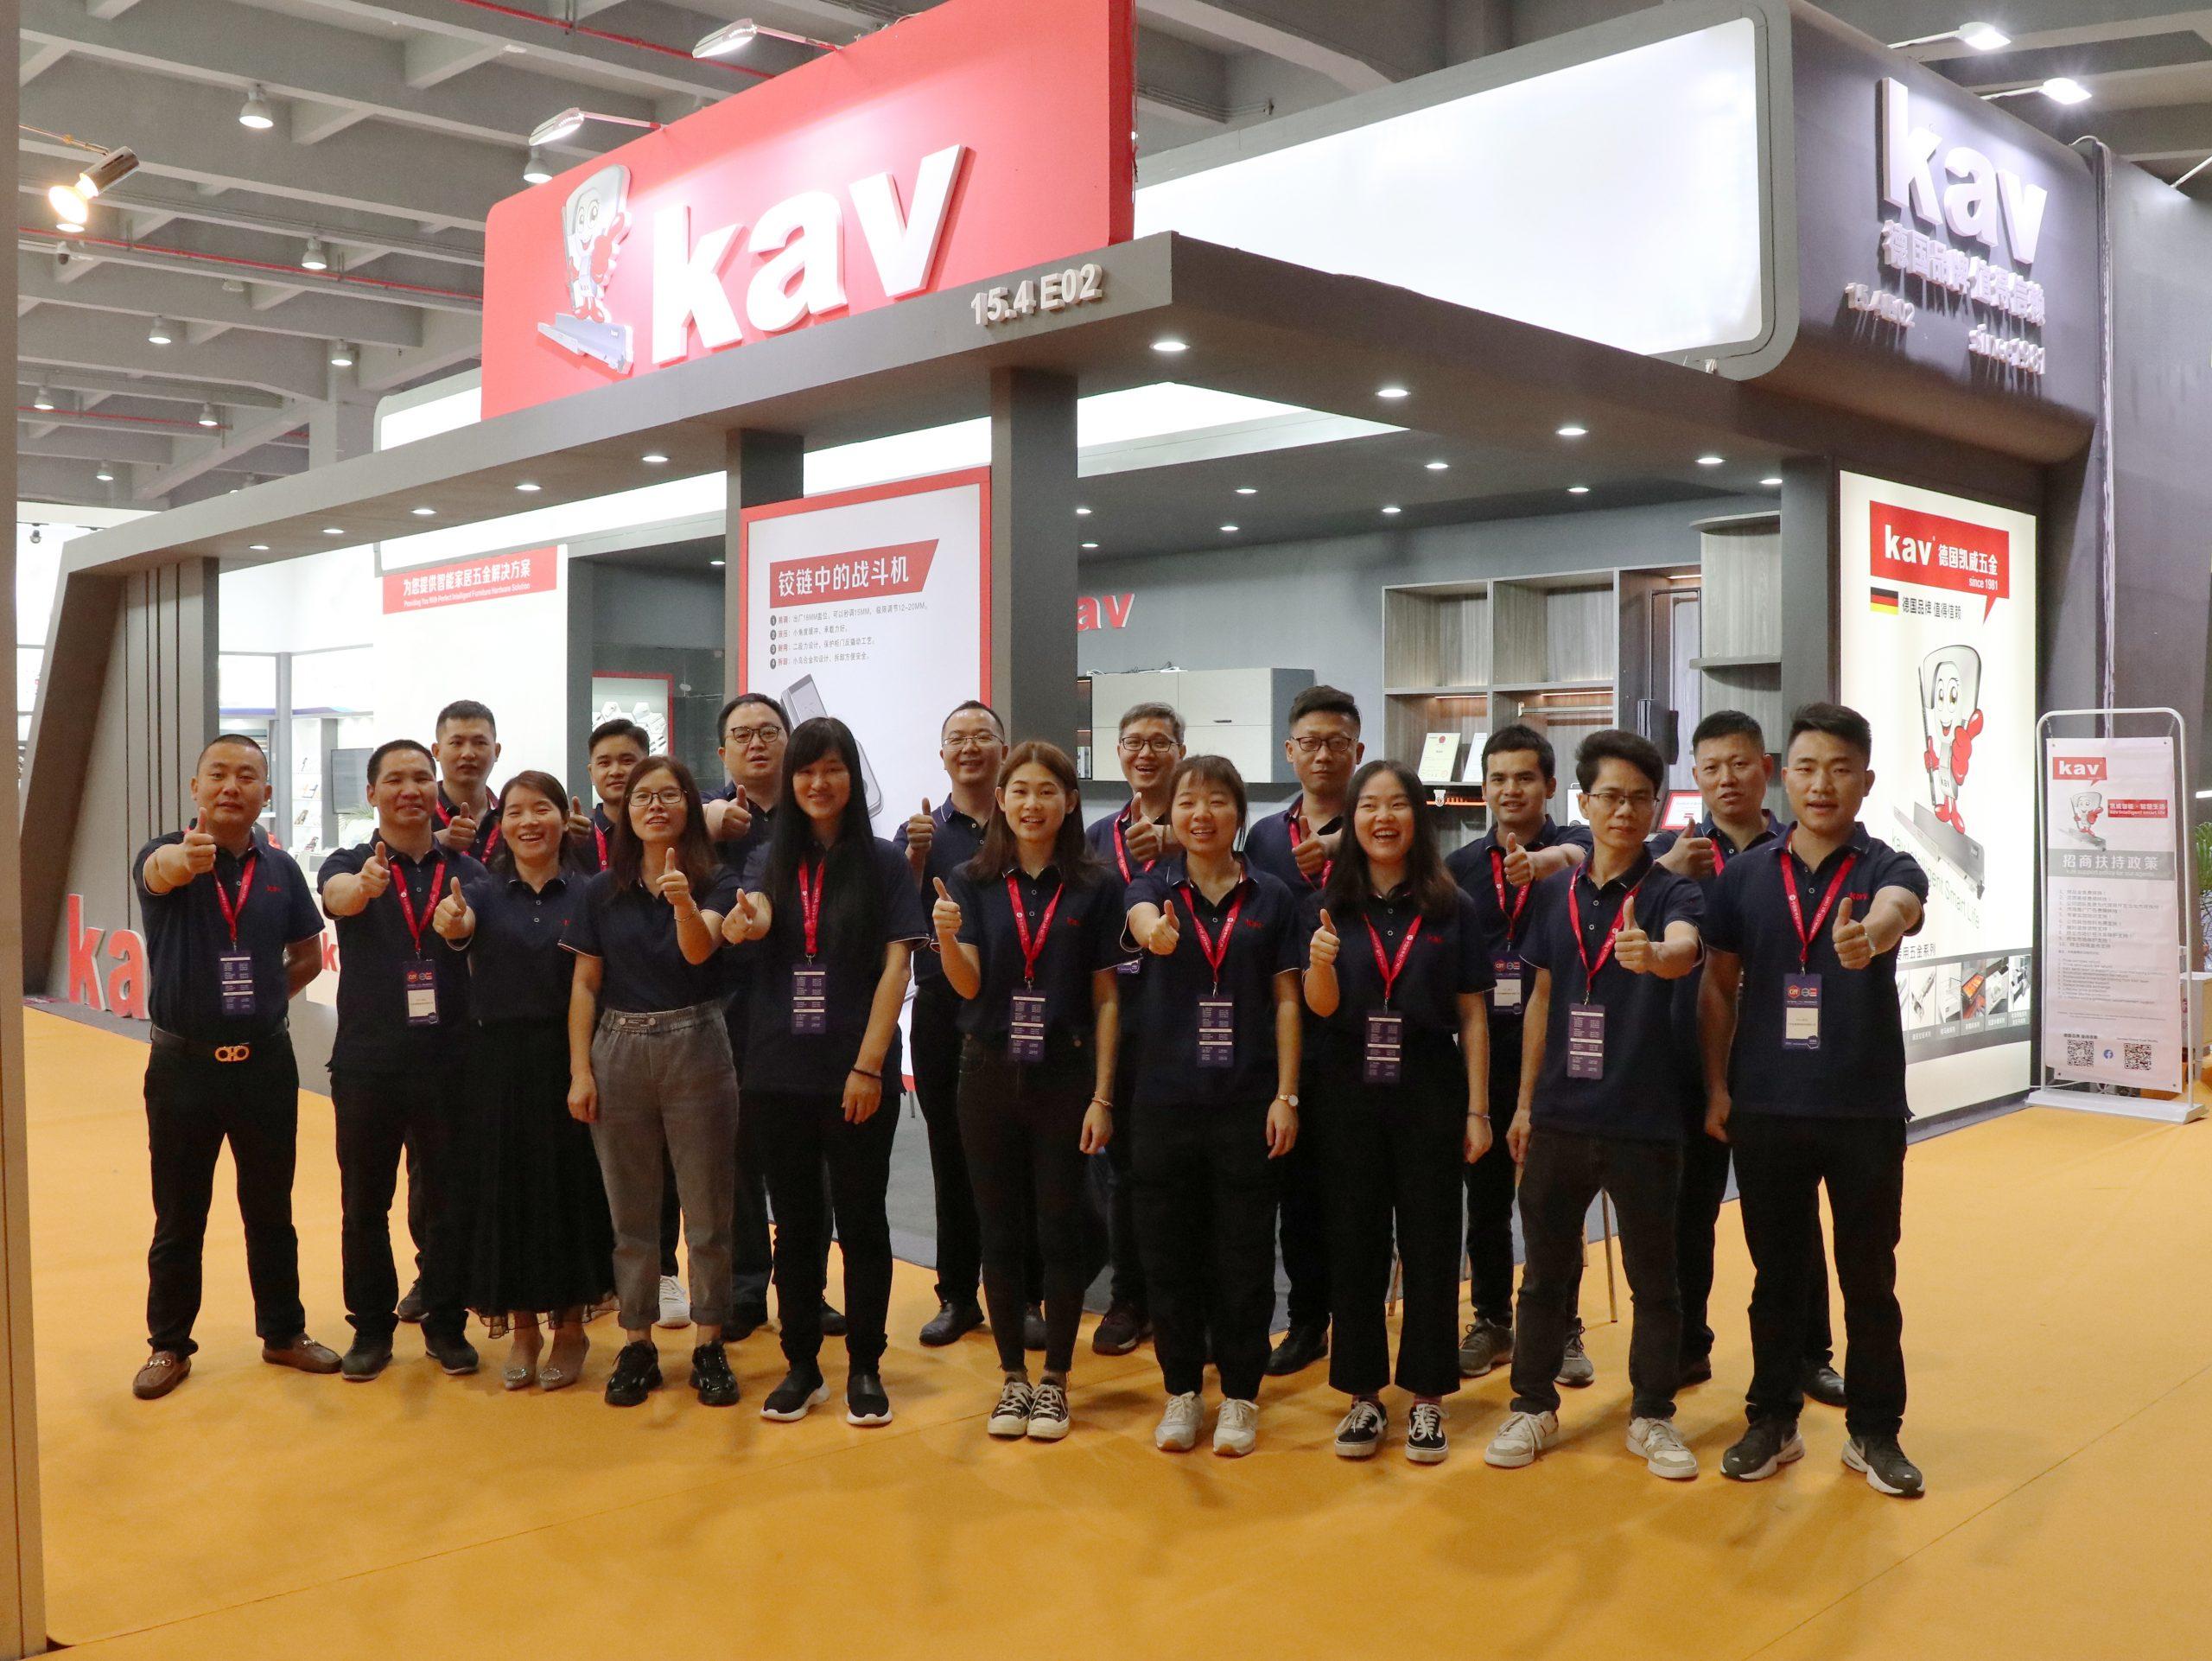 kav 2021 中国(广州)国际建筑装饰博览会